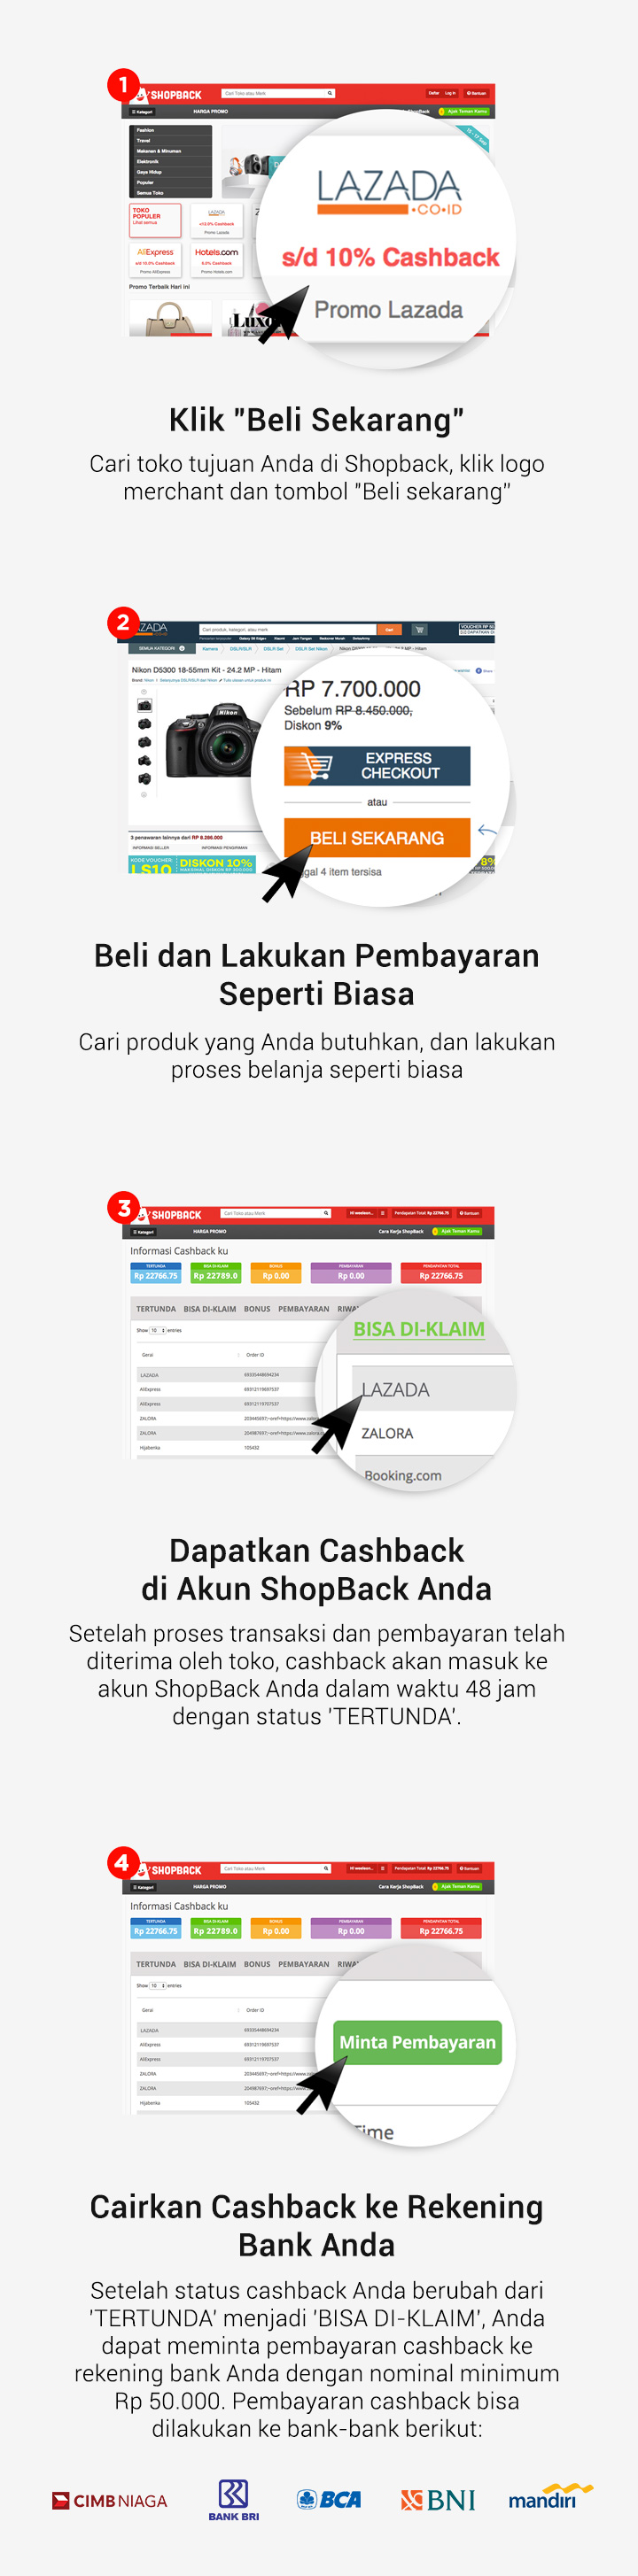 Cara Kerja ShopBack 2